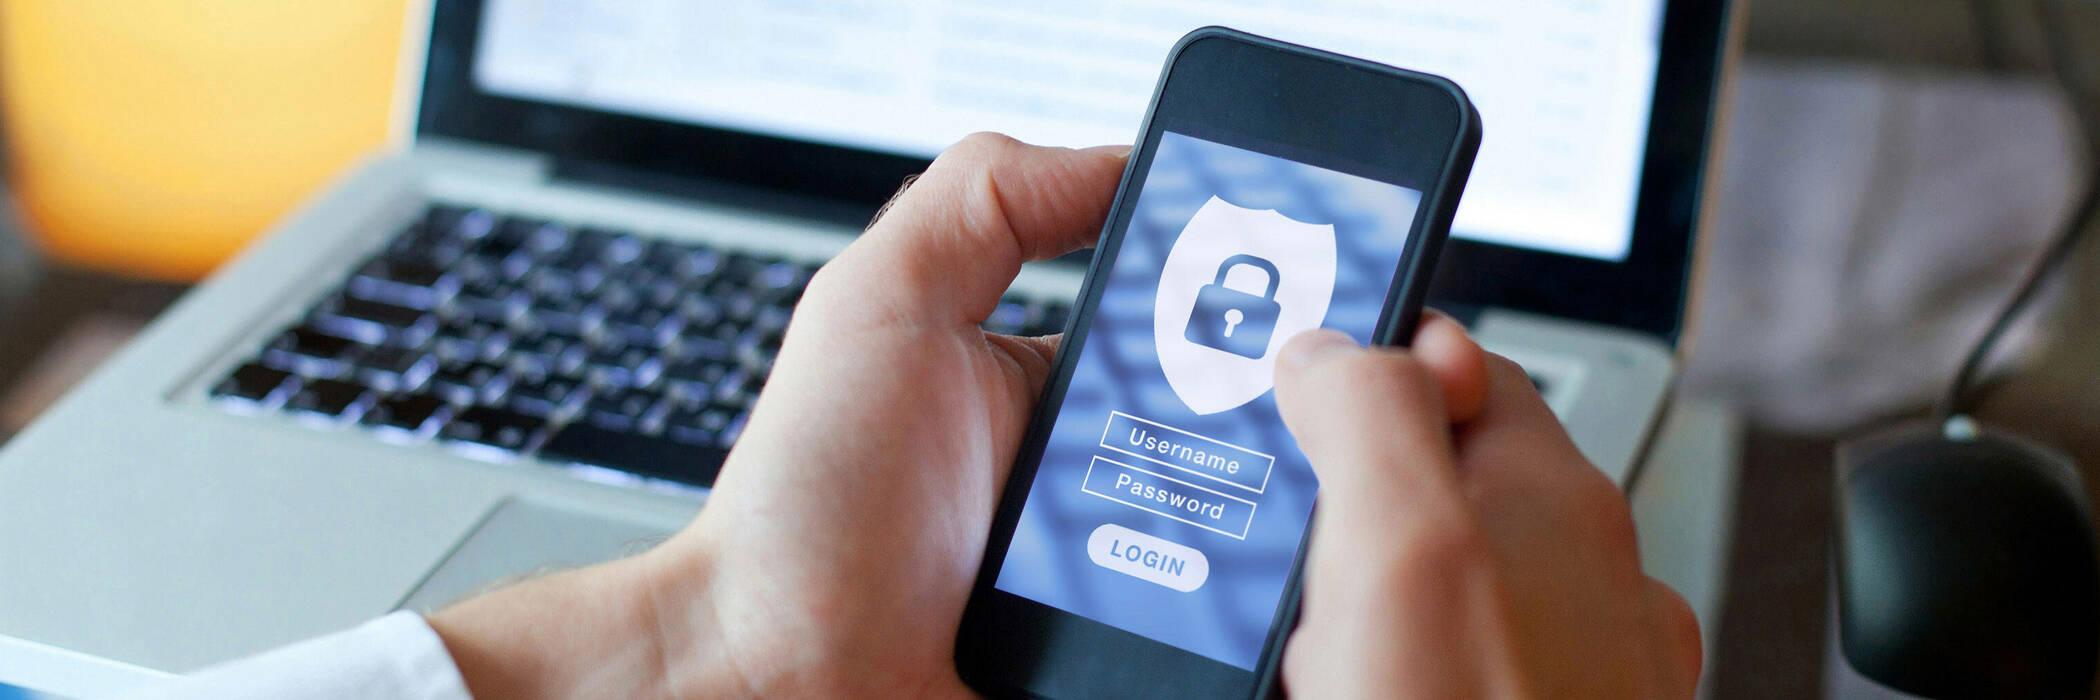 Data security phone log in